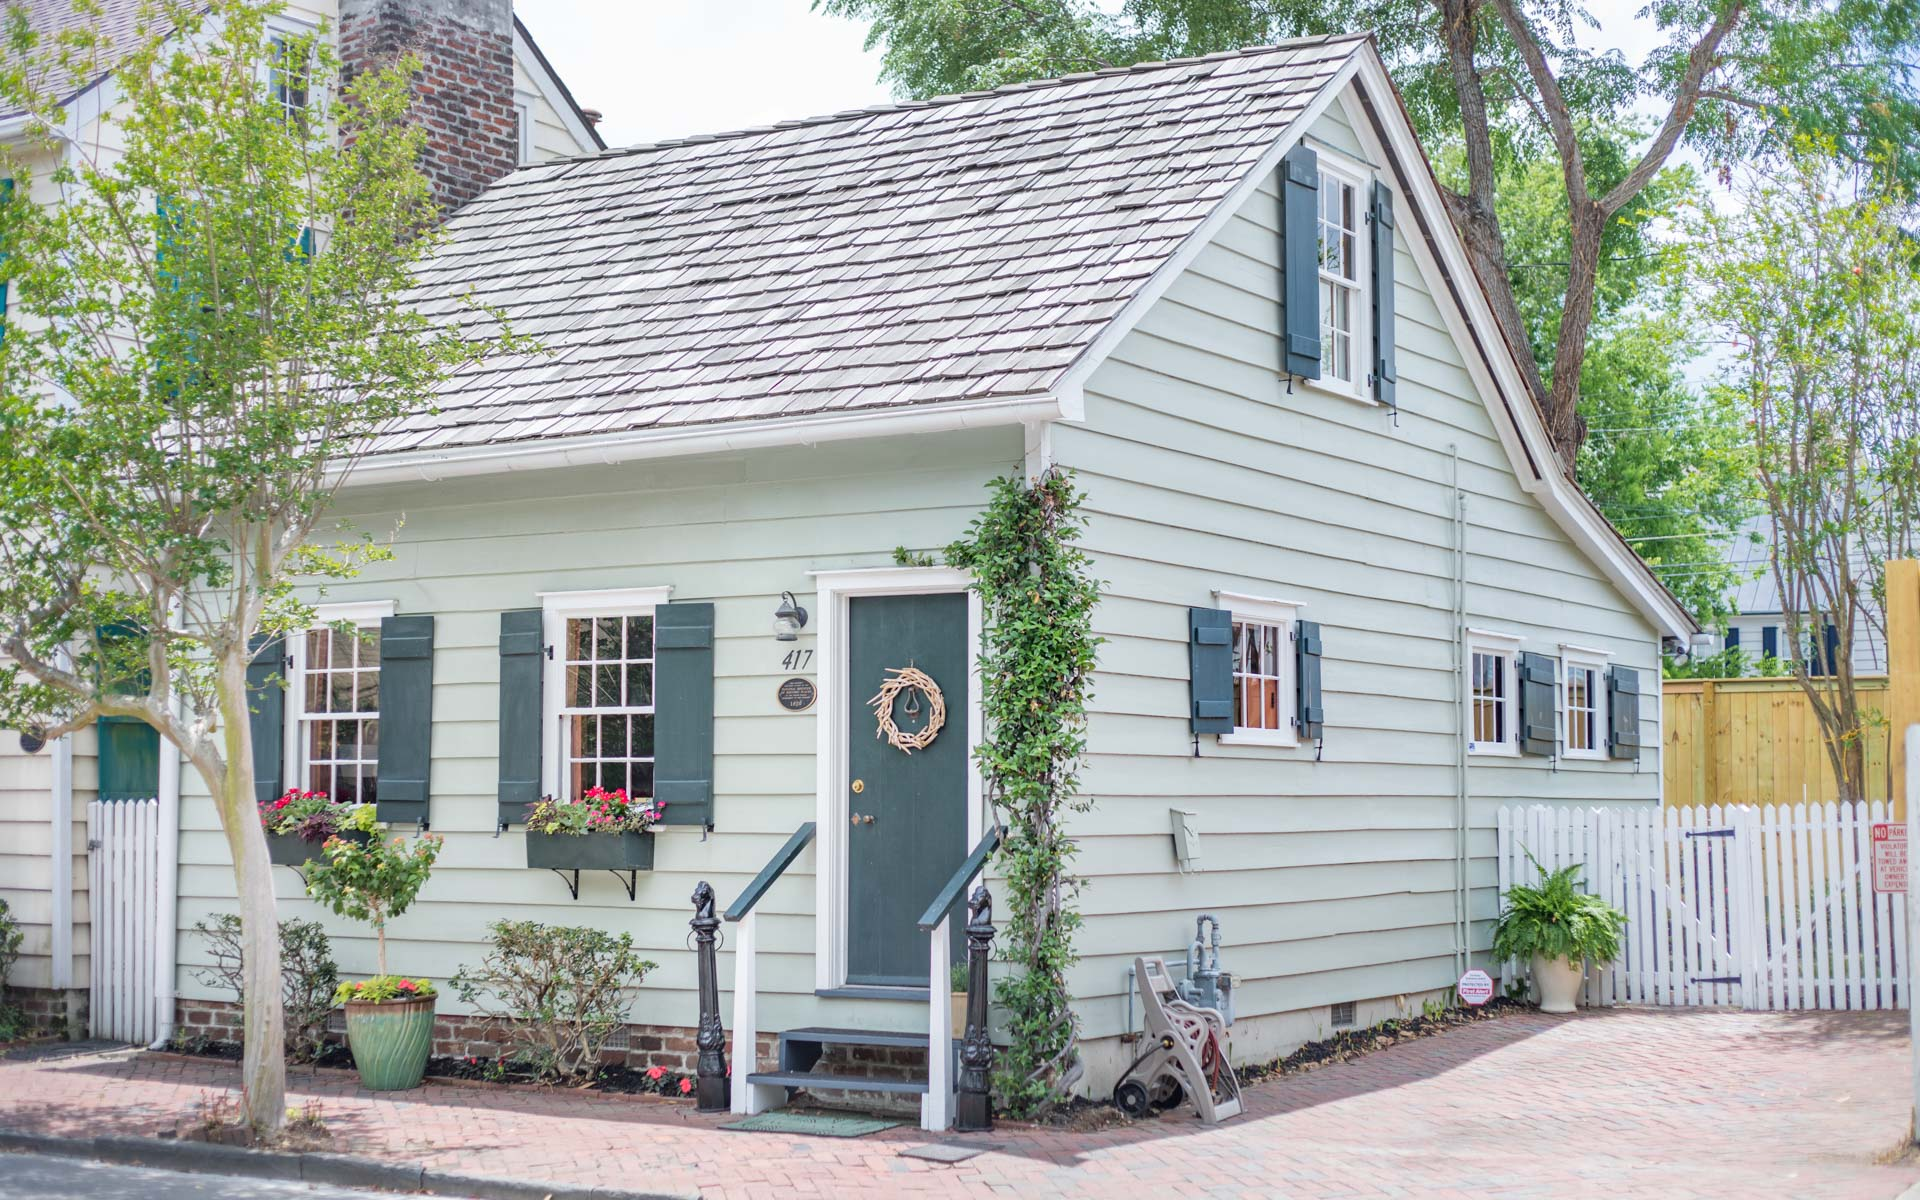 Vacation Rentals Savannah Ga >> Freeman S Cottage Savannah Rentals Lucky Savannah